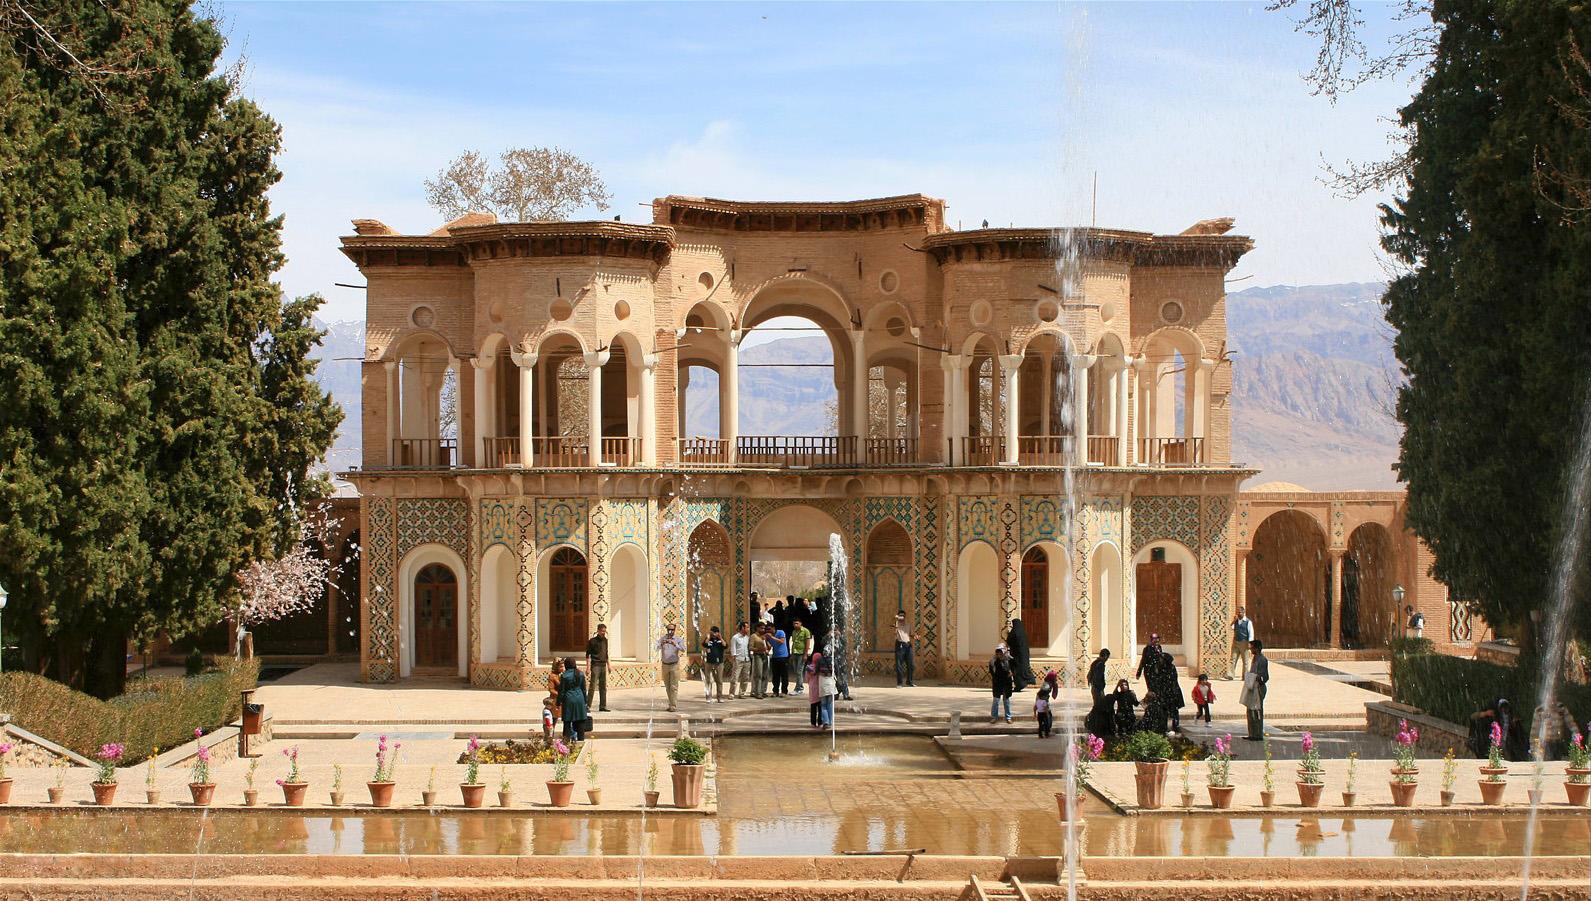 Day 7, Dec. 30th: Kerman-Yazd